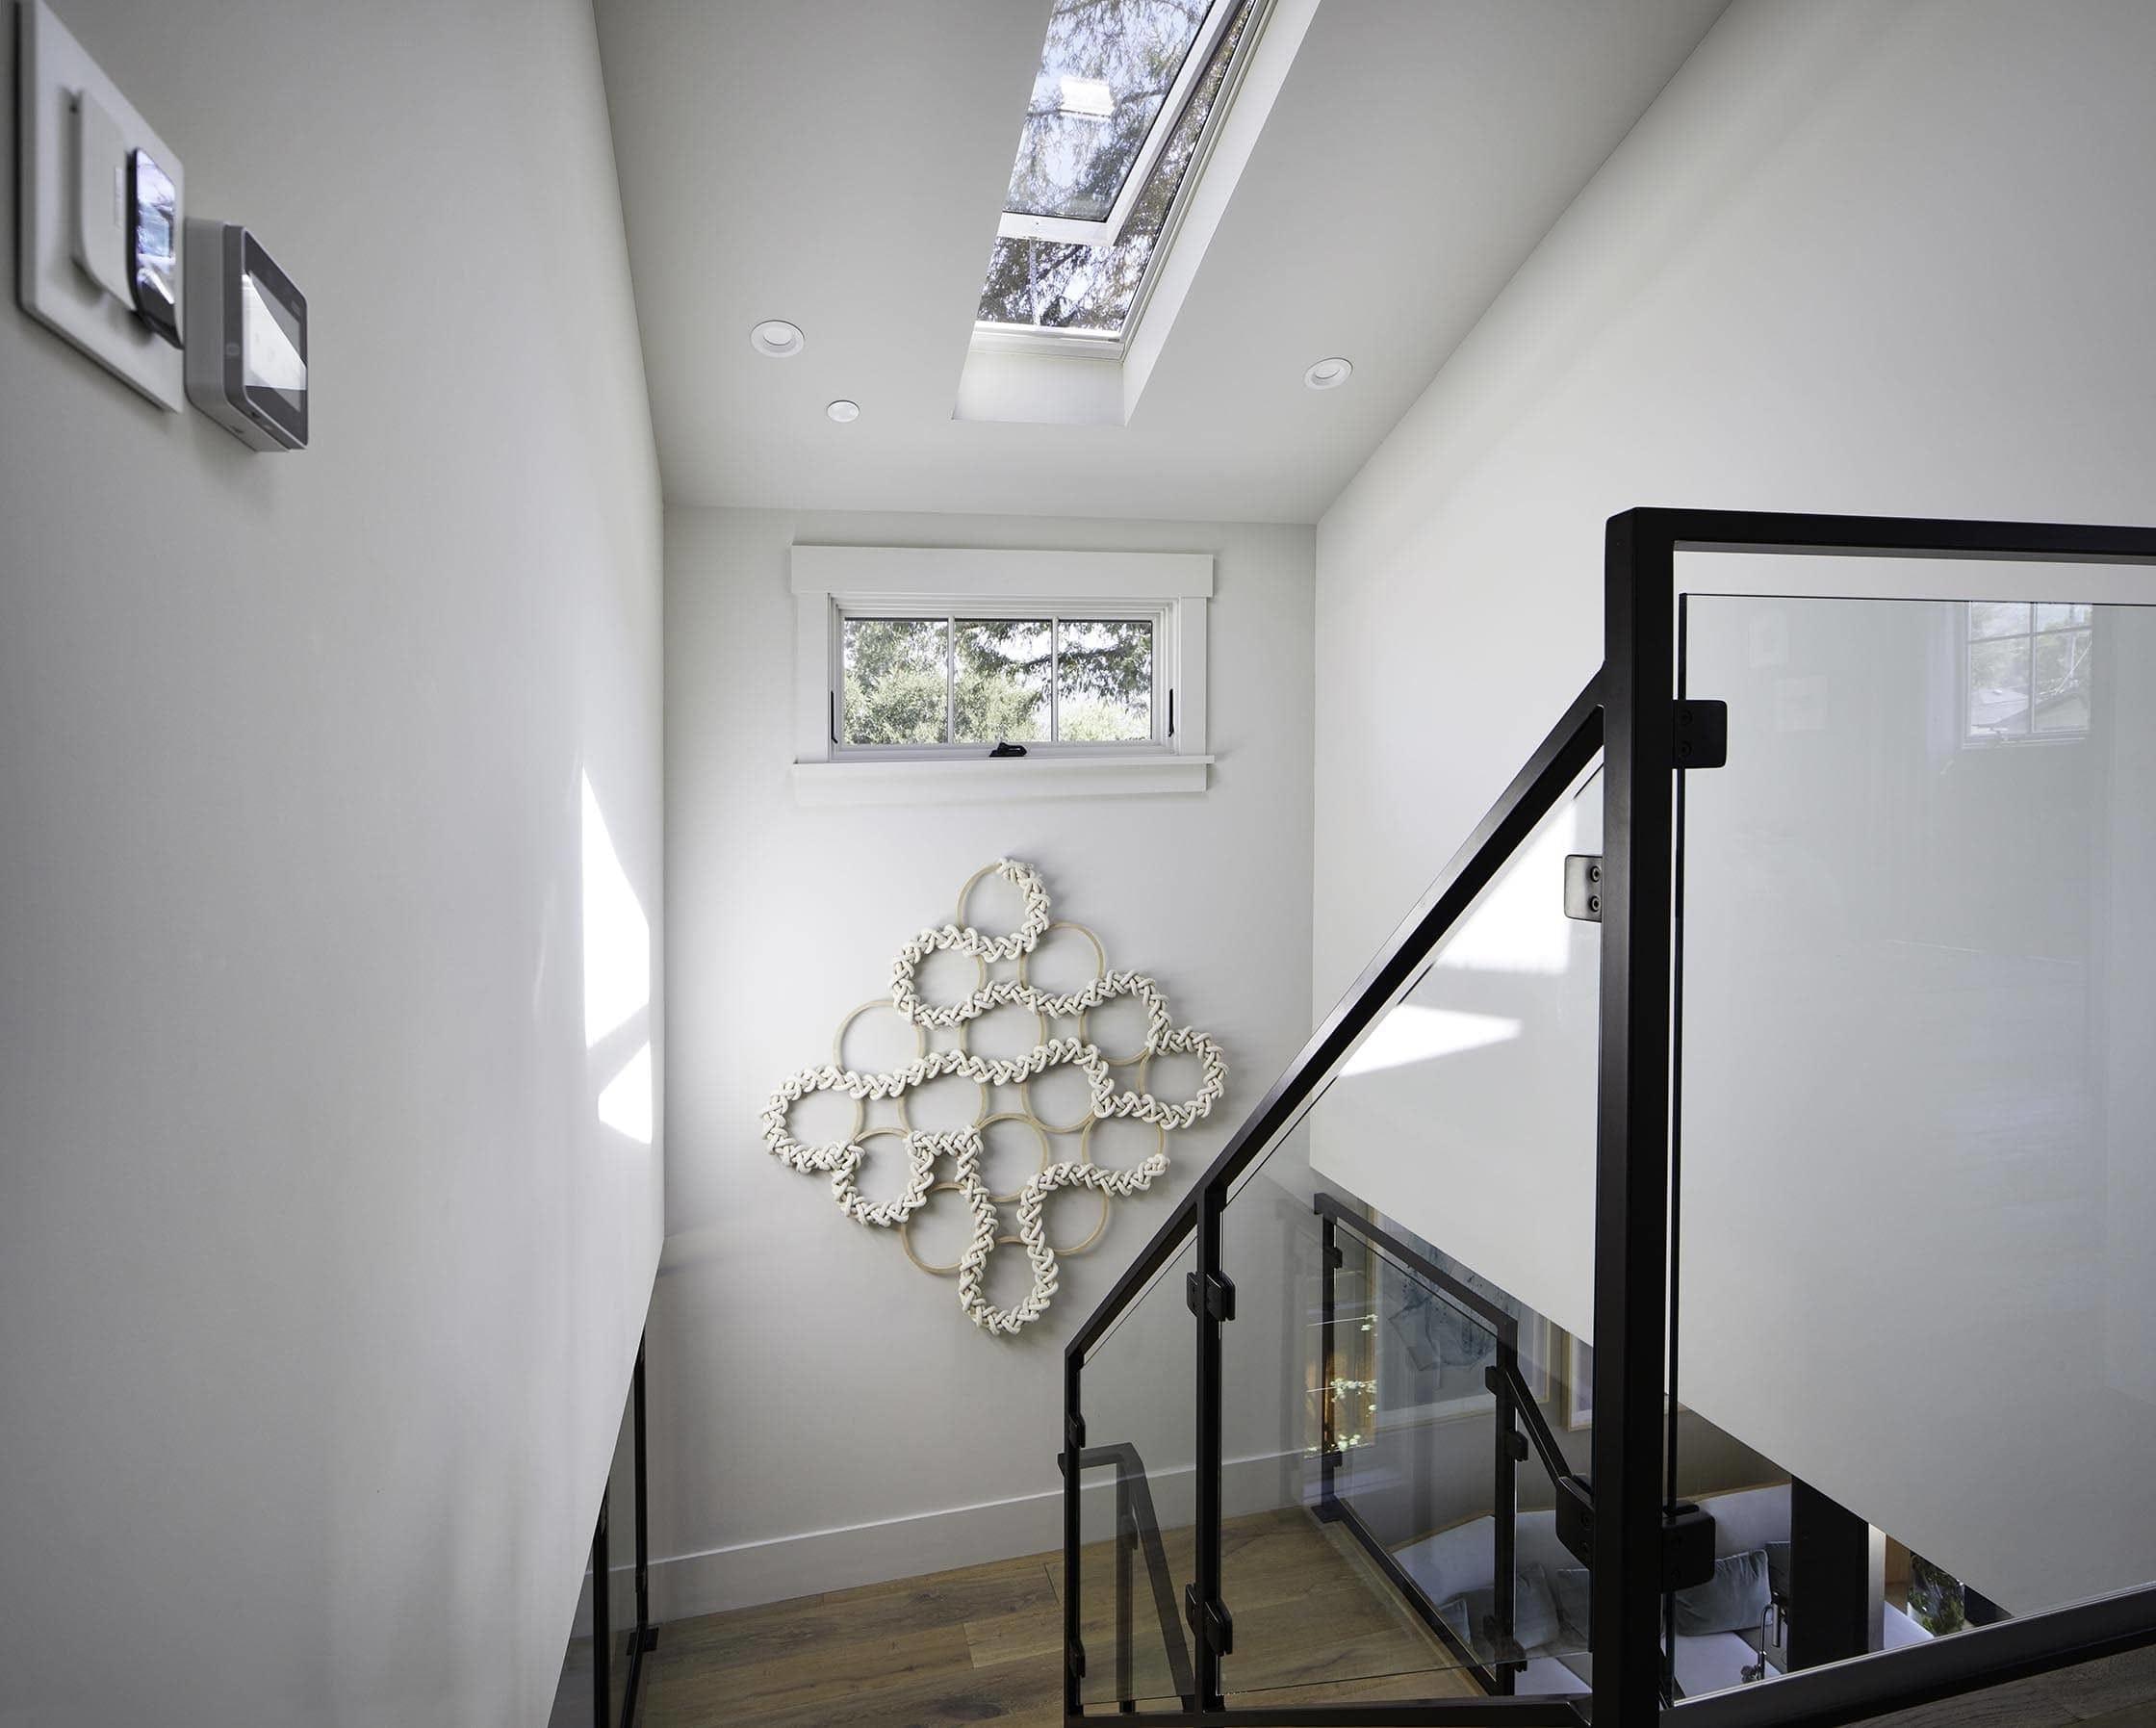 Gallery stairwell texture